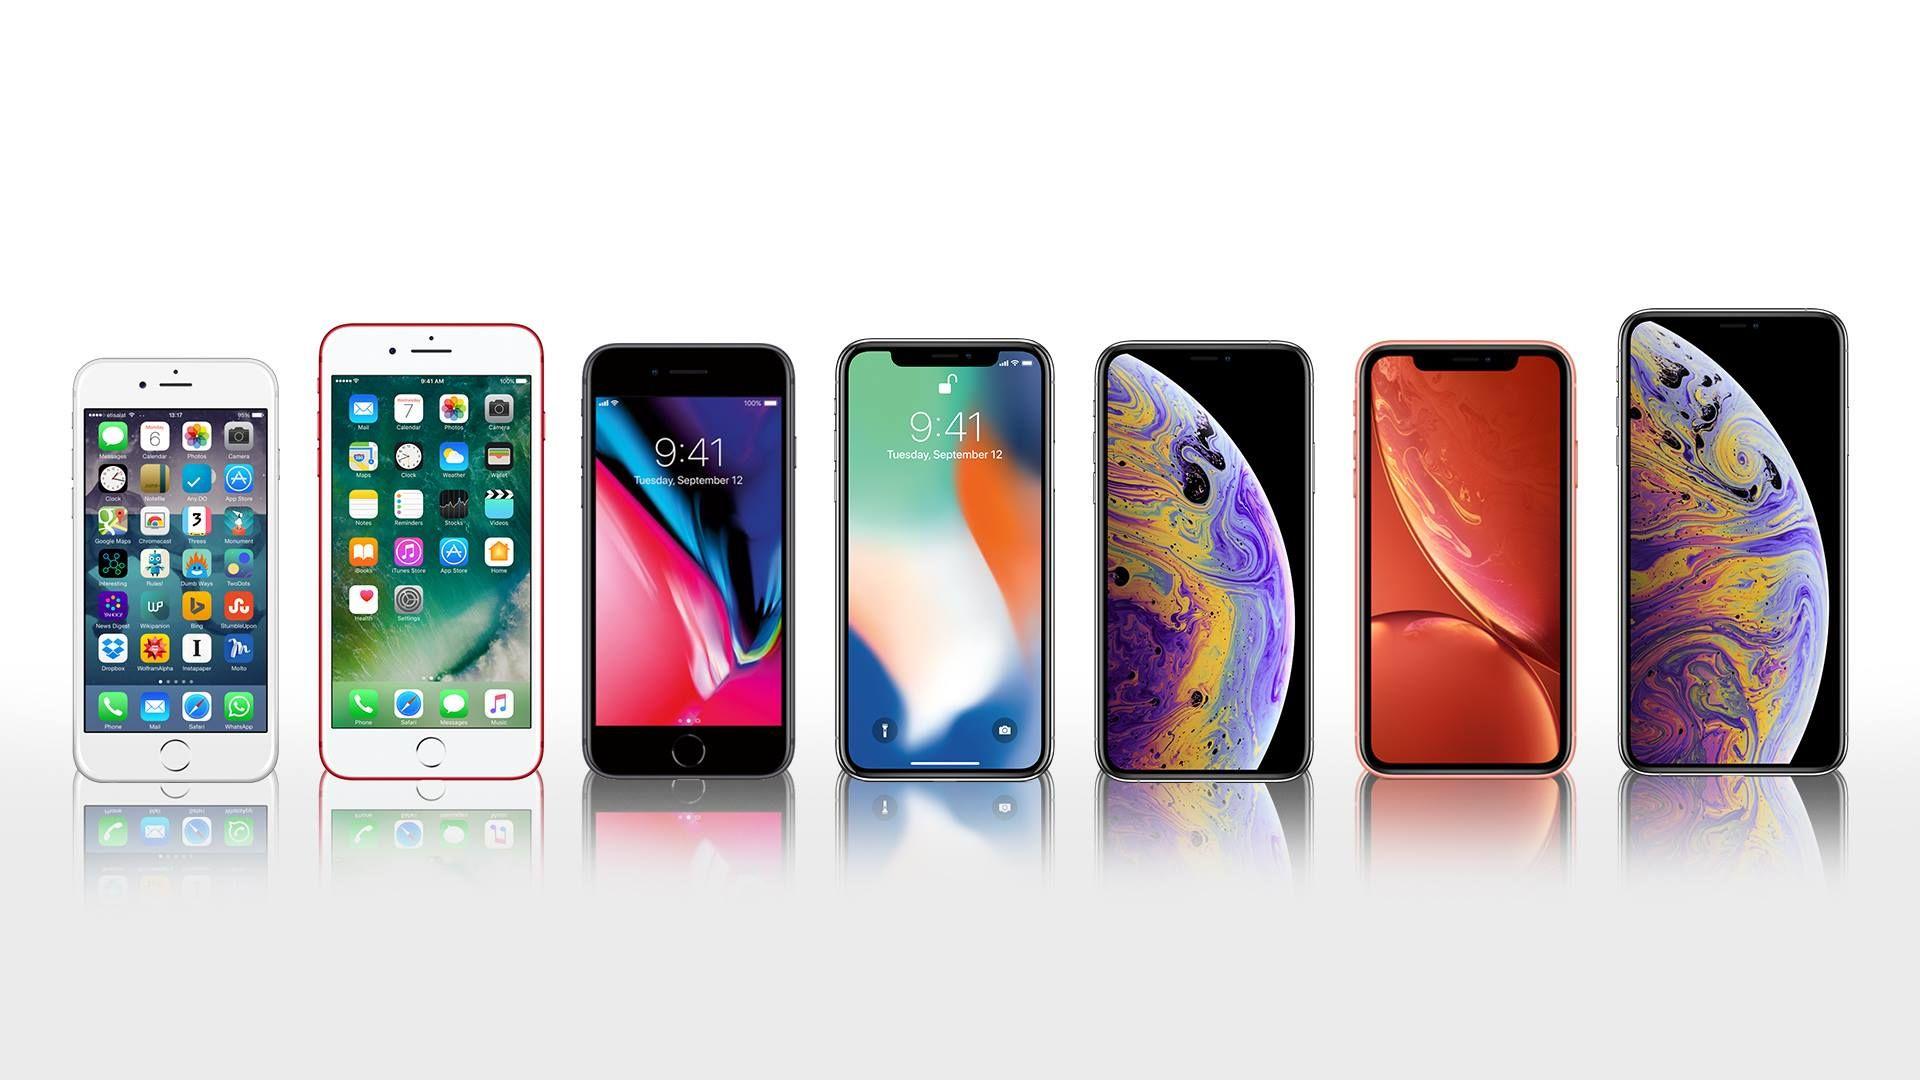 iPhone 7 -iPhone XS Max